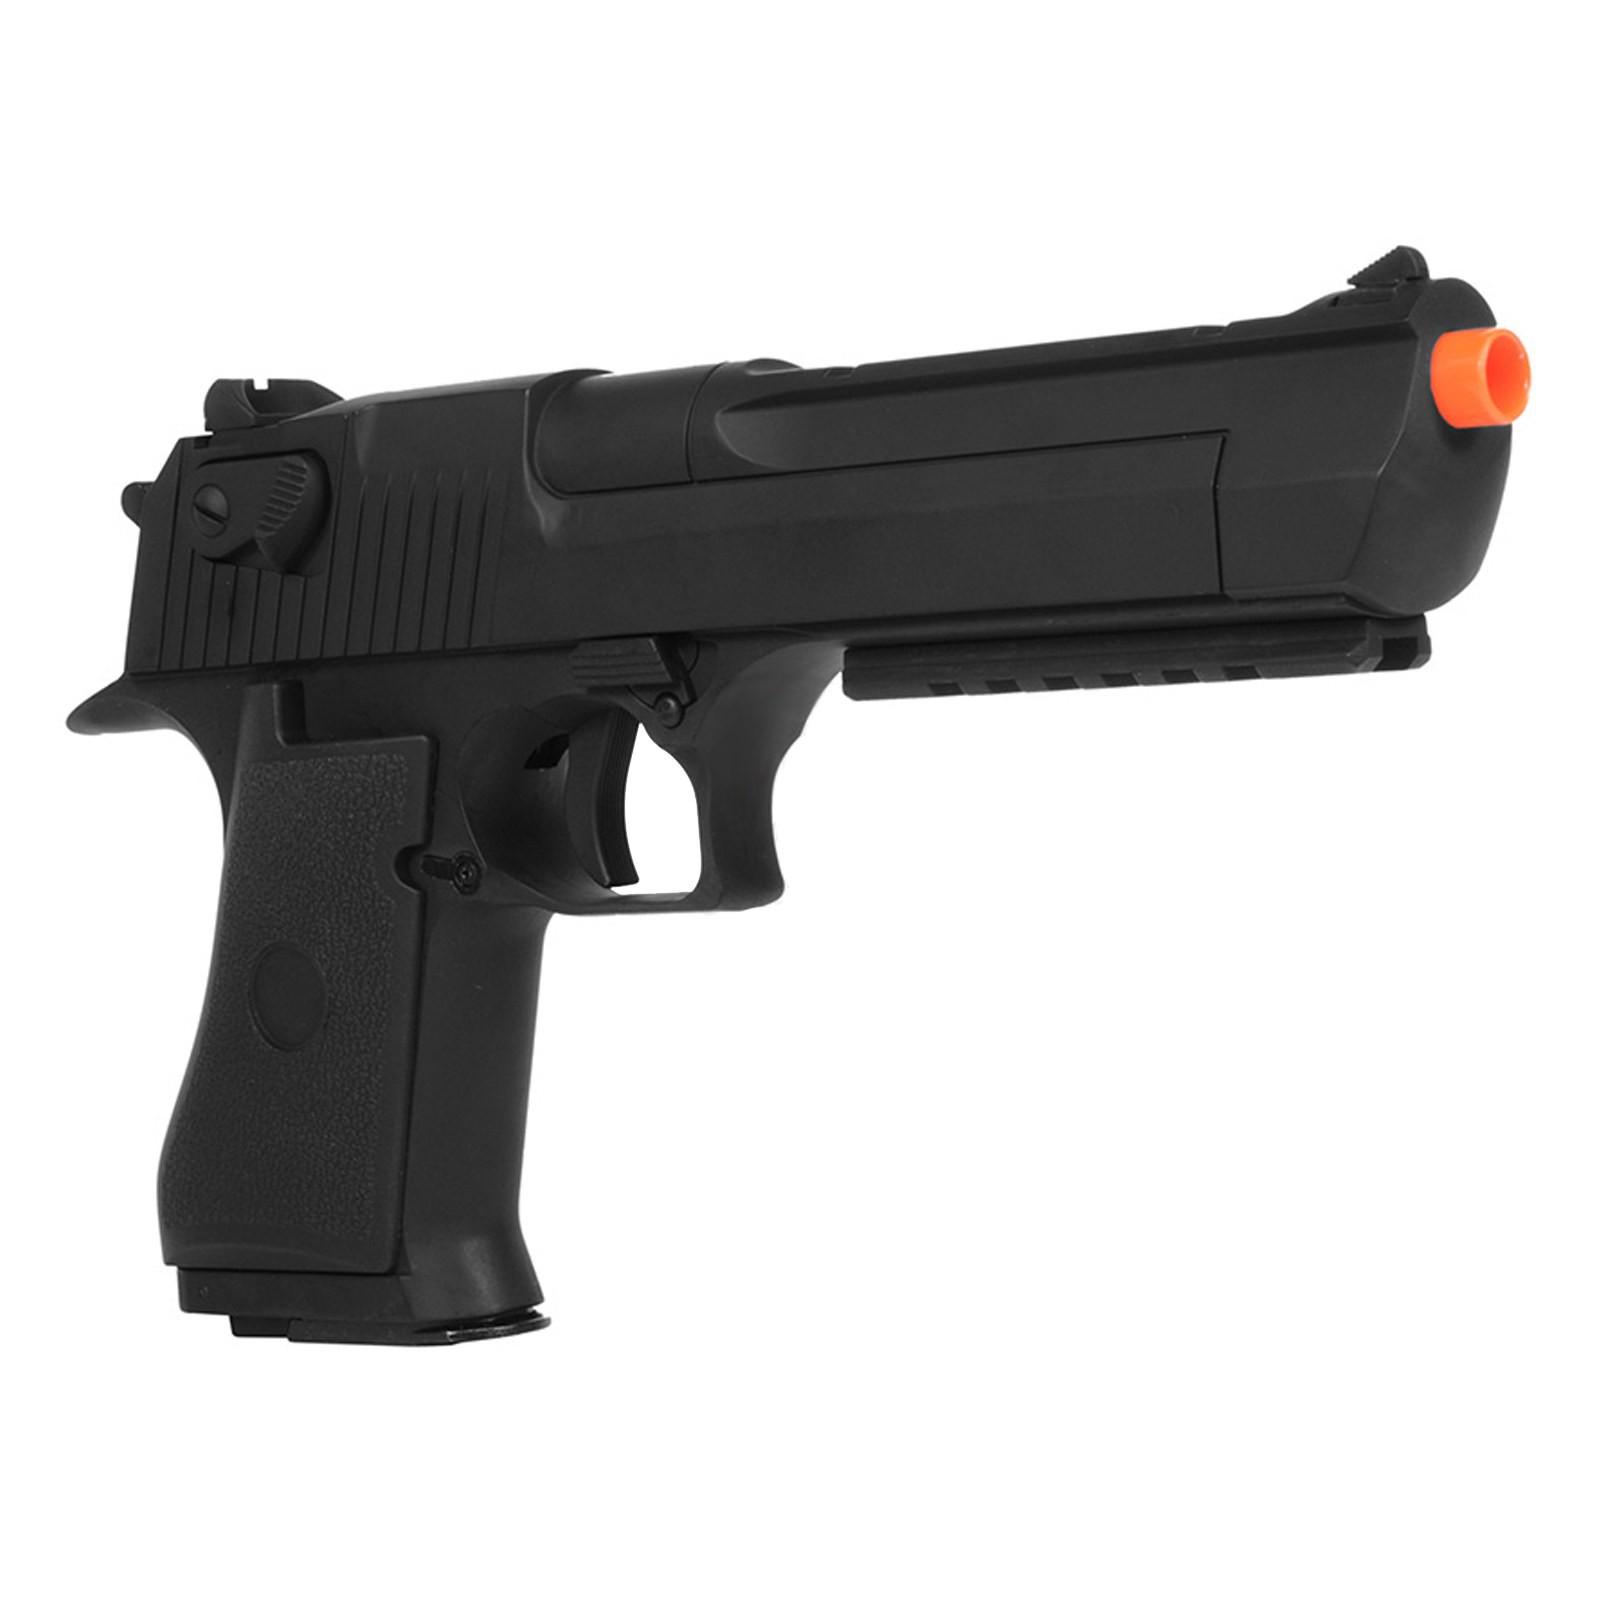 Pistola Desert Eagle Elettrica in Metallo Abs per Softair Raffica CYMA CM121